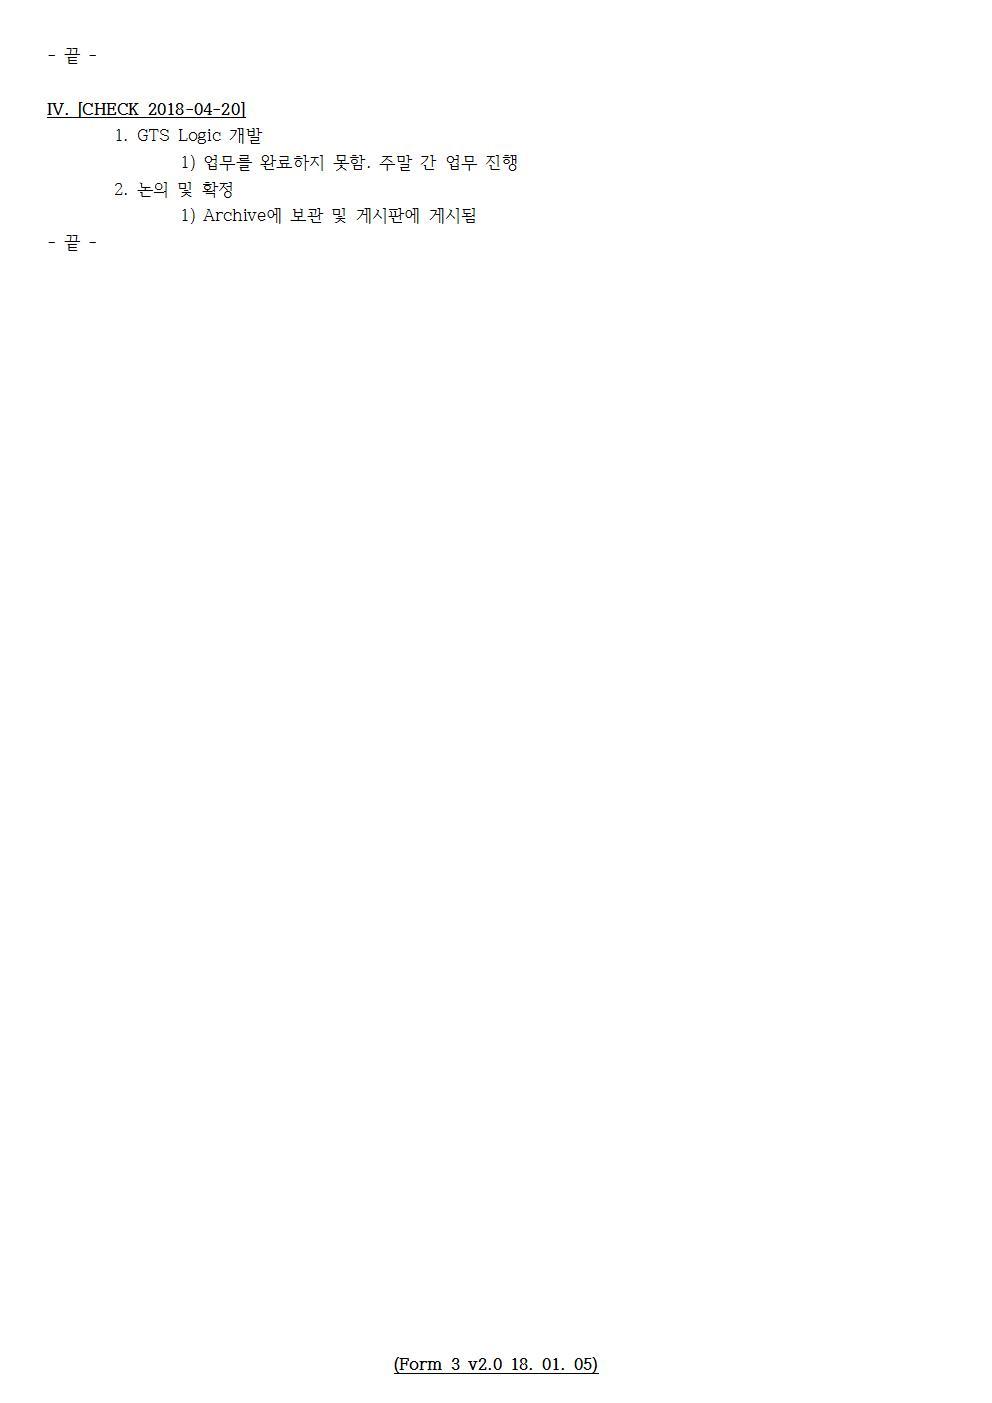 D-[18-001-RD-01]-[SAVE 3.0]-[2018-04-20][SH]002.jpg